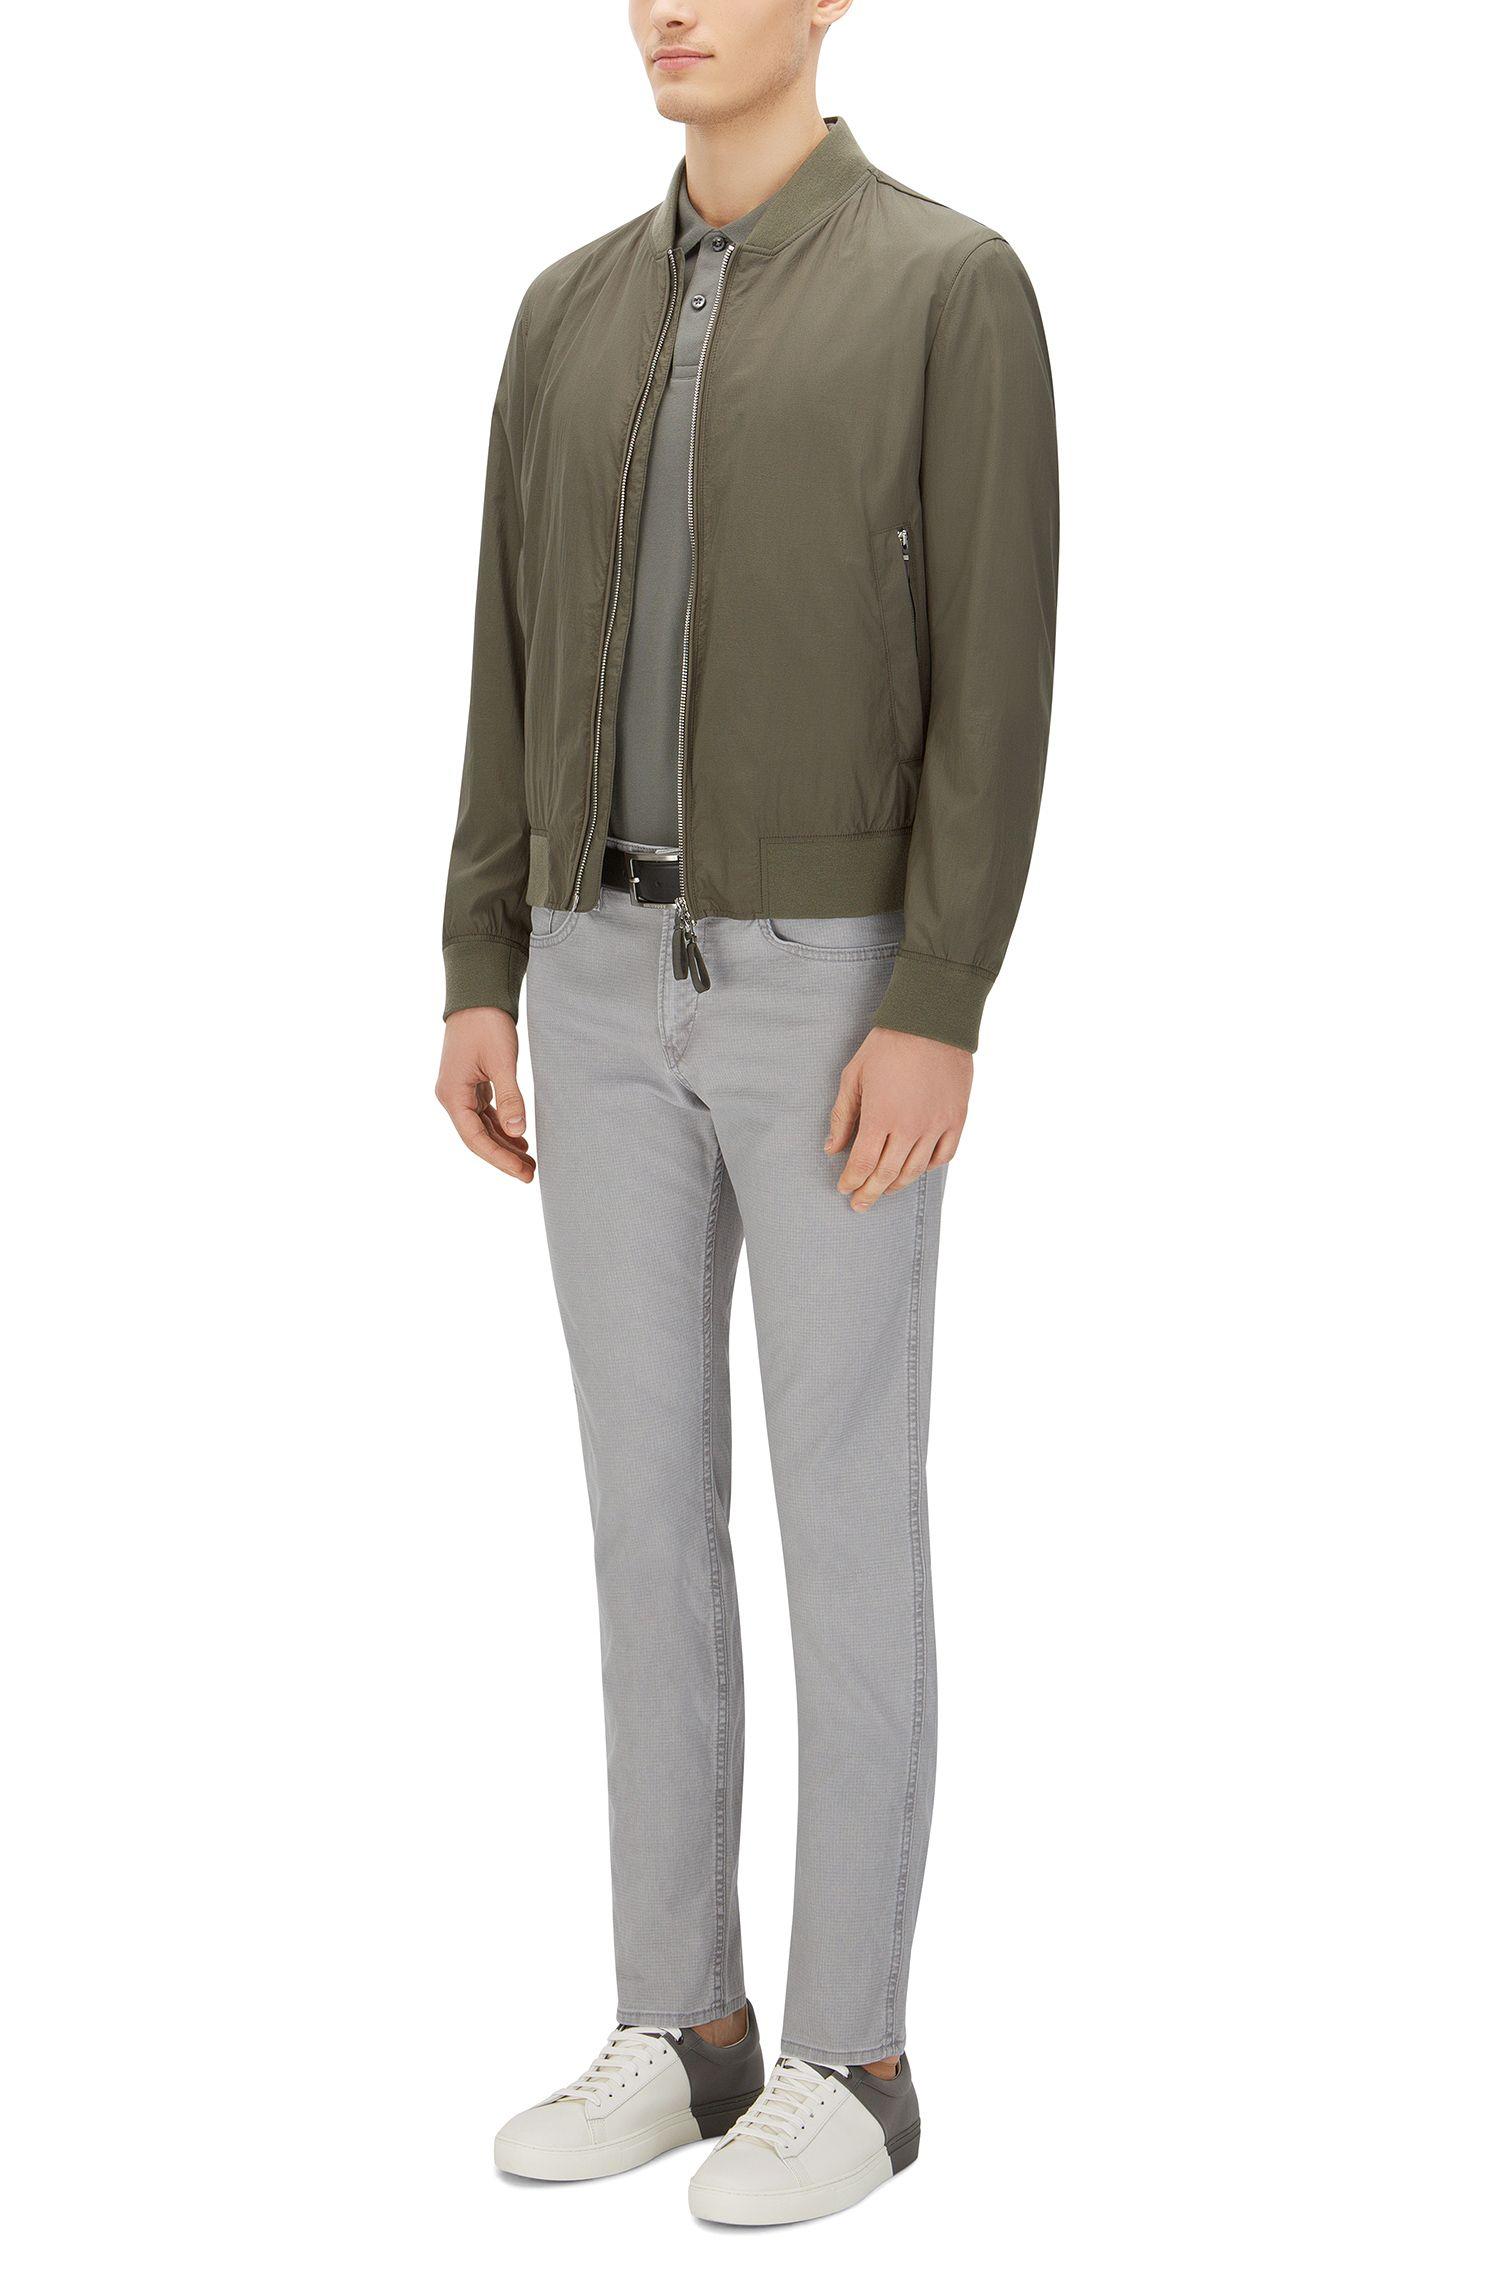 10 oz Patterned Stretch Cotton Pants, Slim Fit | Delaware